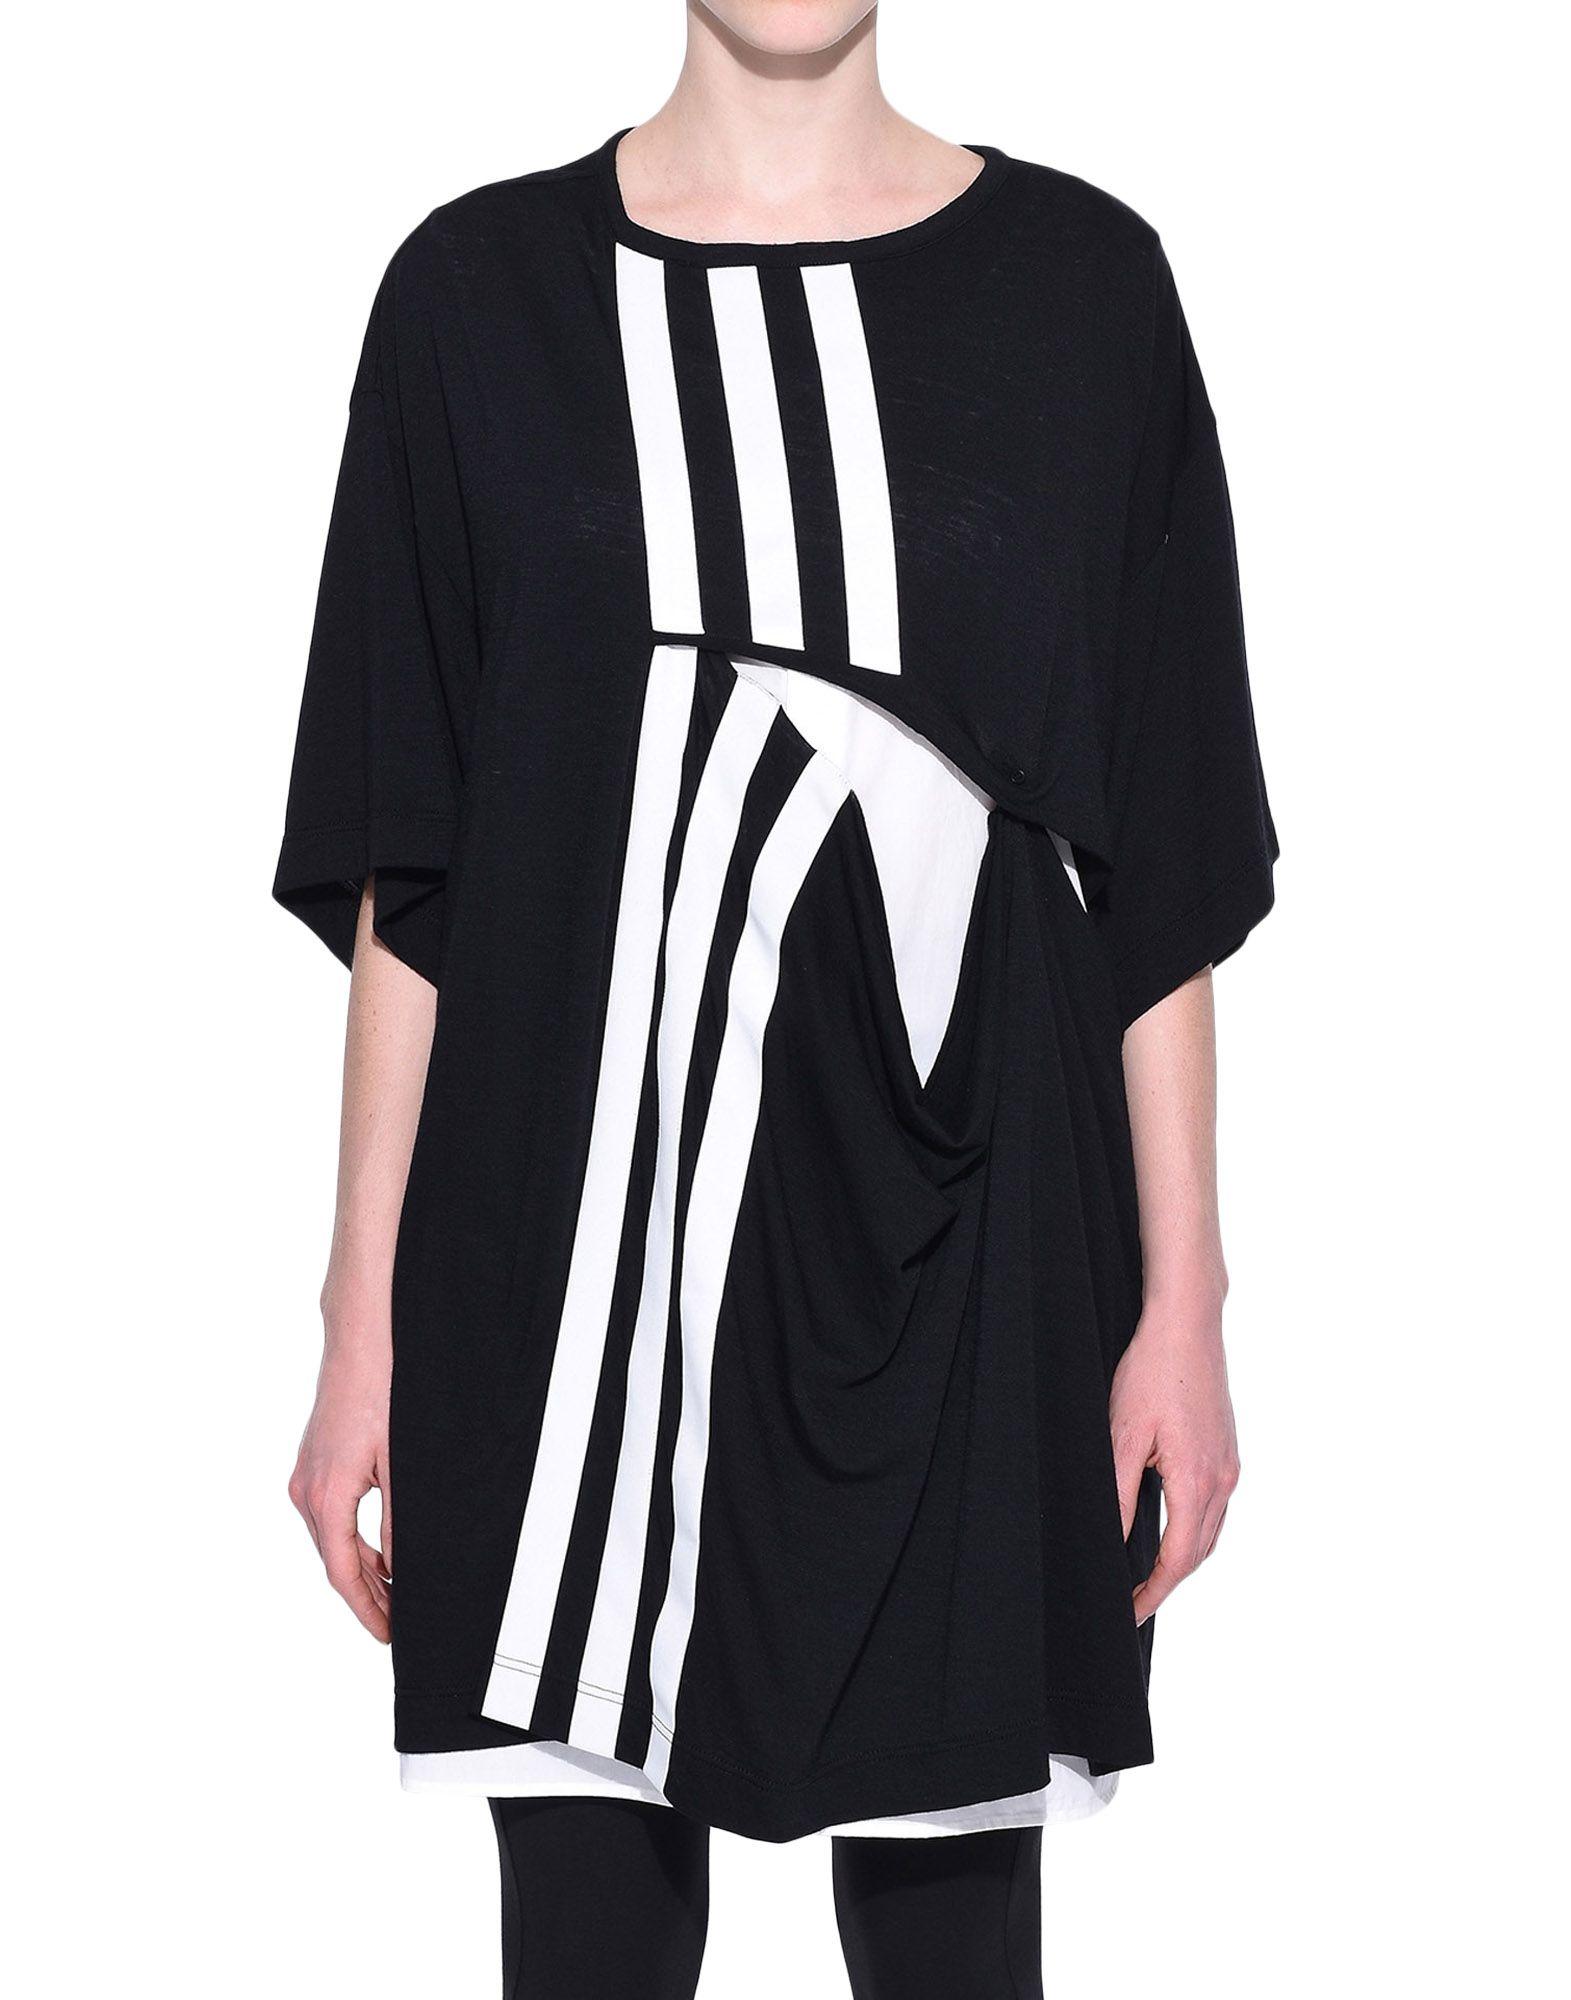 Y-3 Y-3 3-Stripes Layered Tee Short sleeve t-shirt Woman r